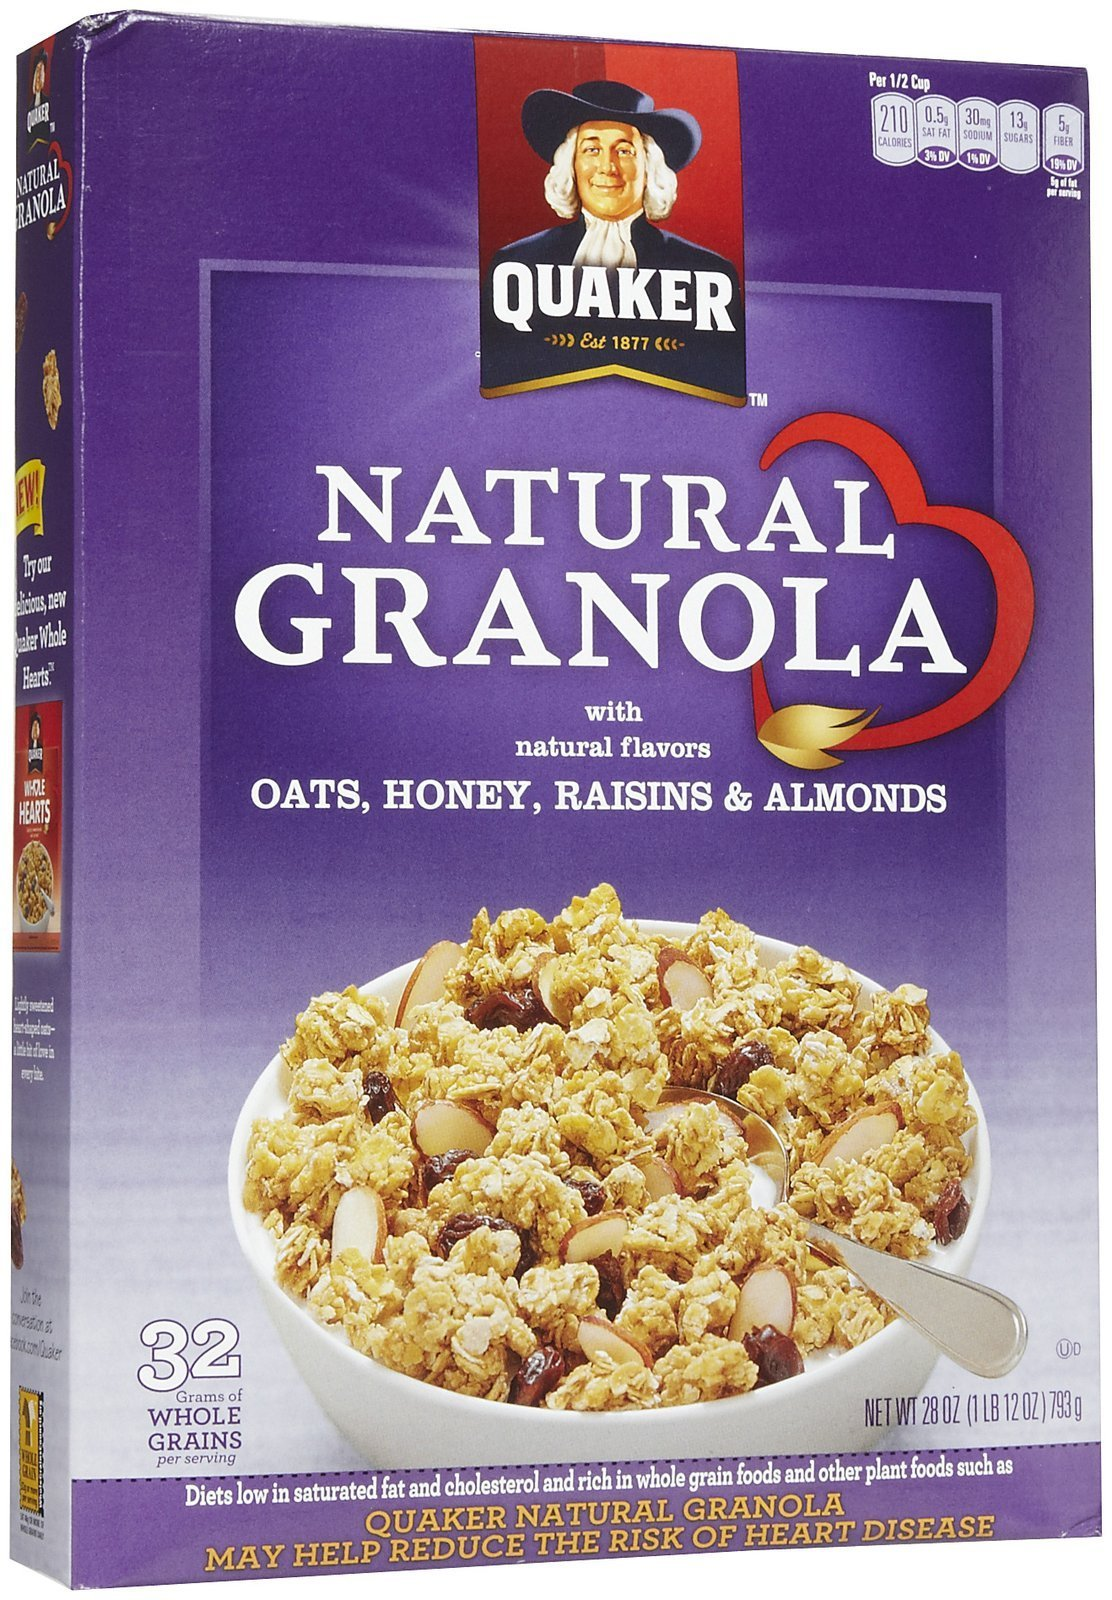 Quaker 100% Natural Cereal w/ Oats, Honey, Raisins & Almonds, 28 oz